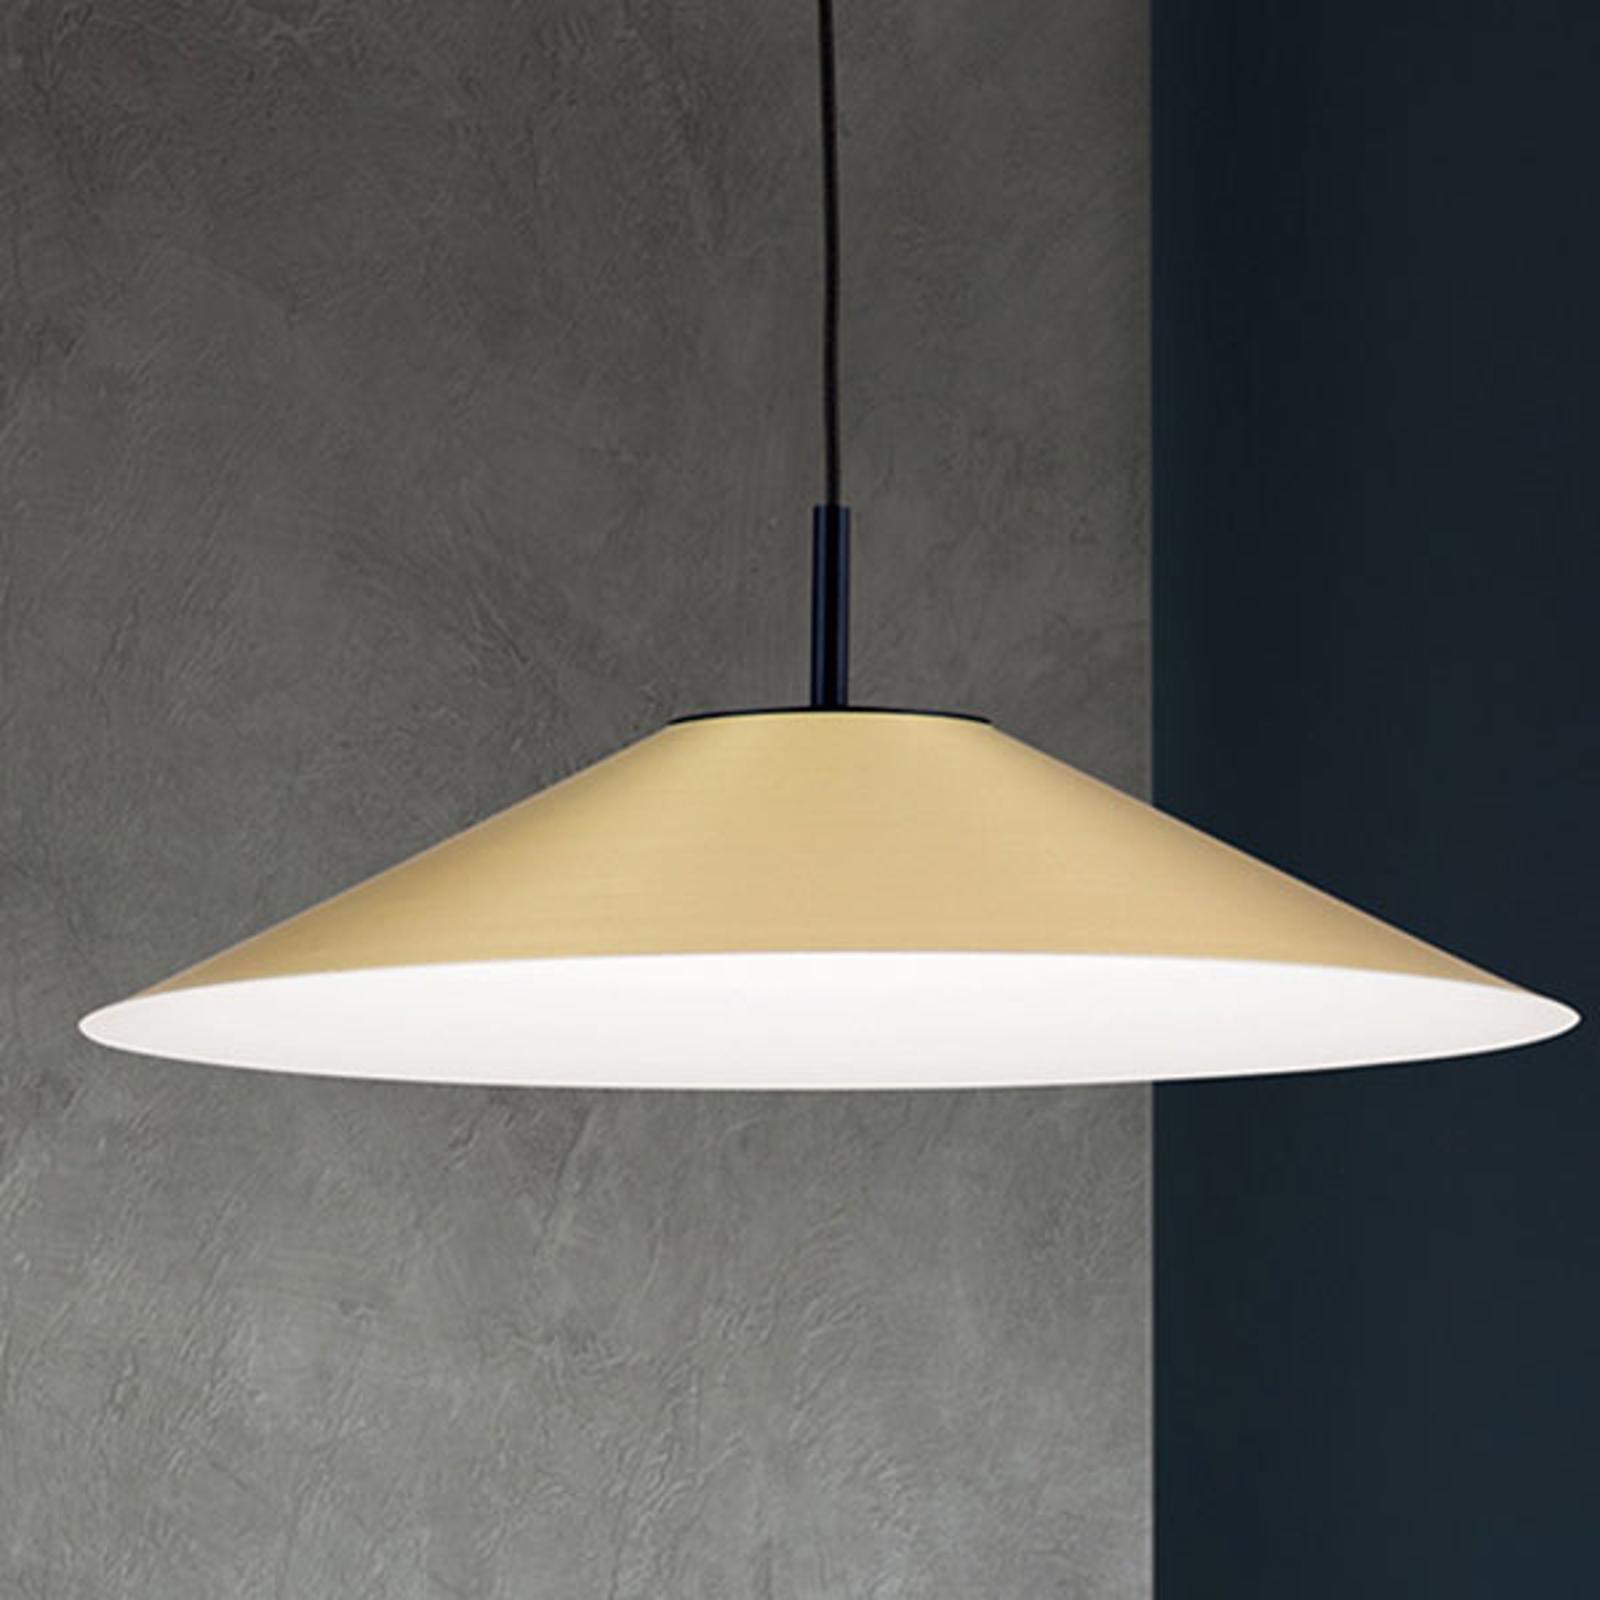 Suspension LED Gourmet, abat-jour laiton-mat